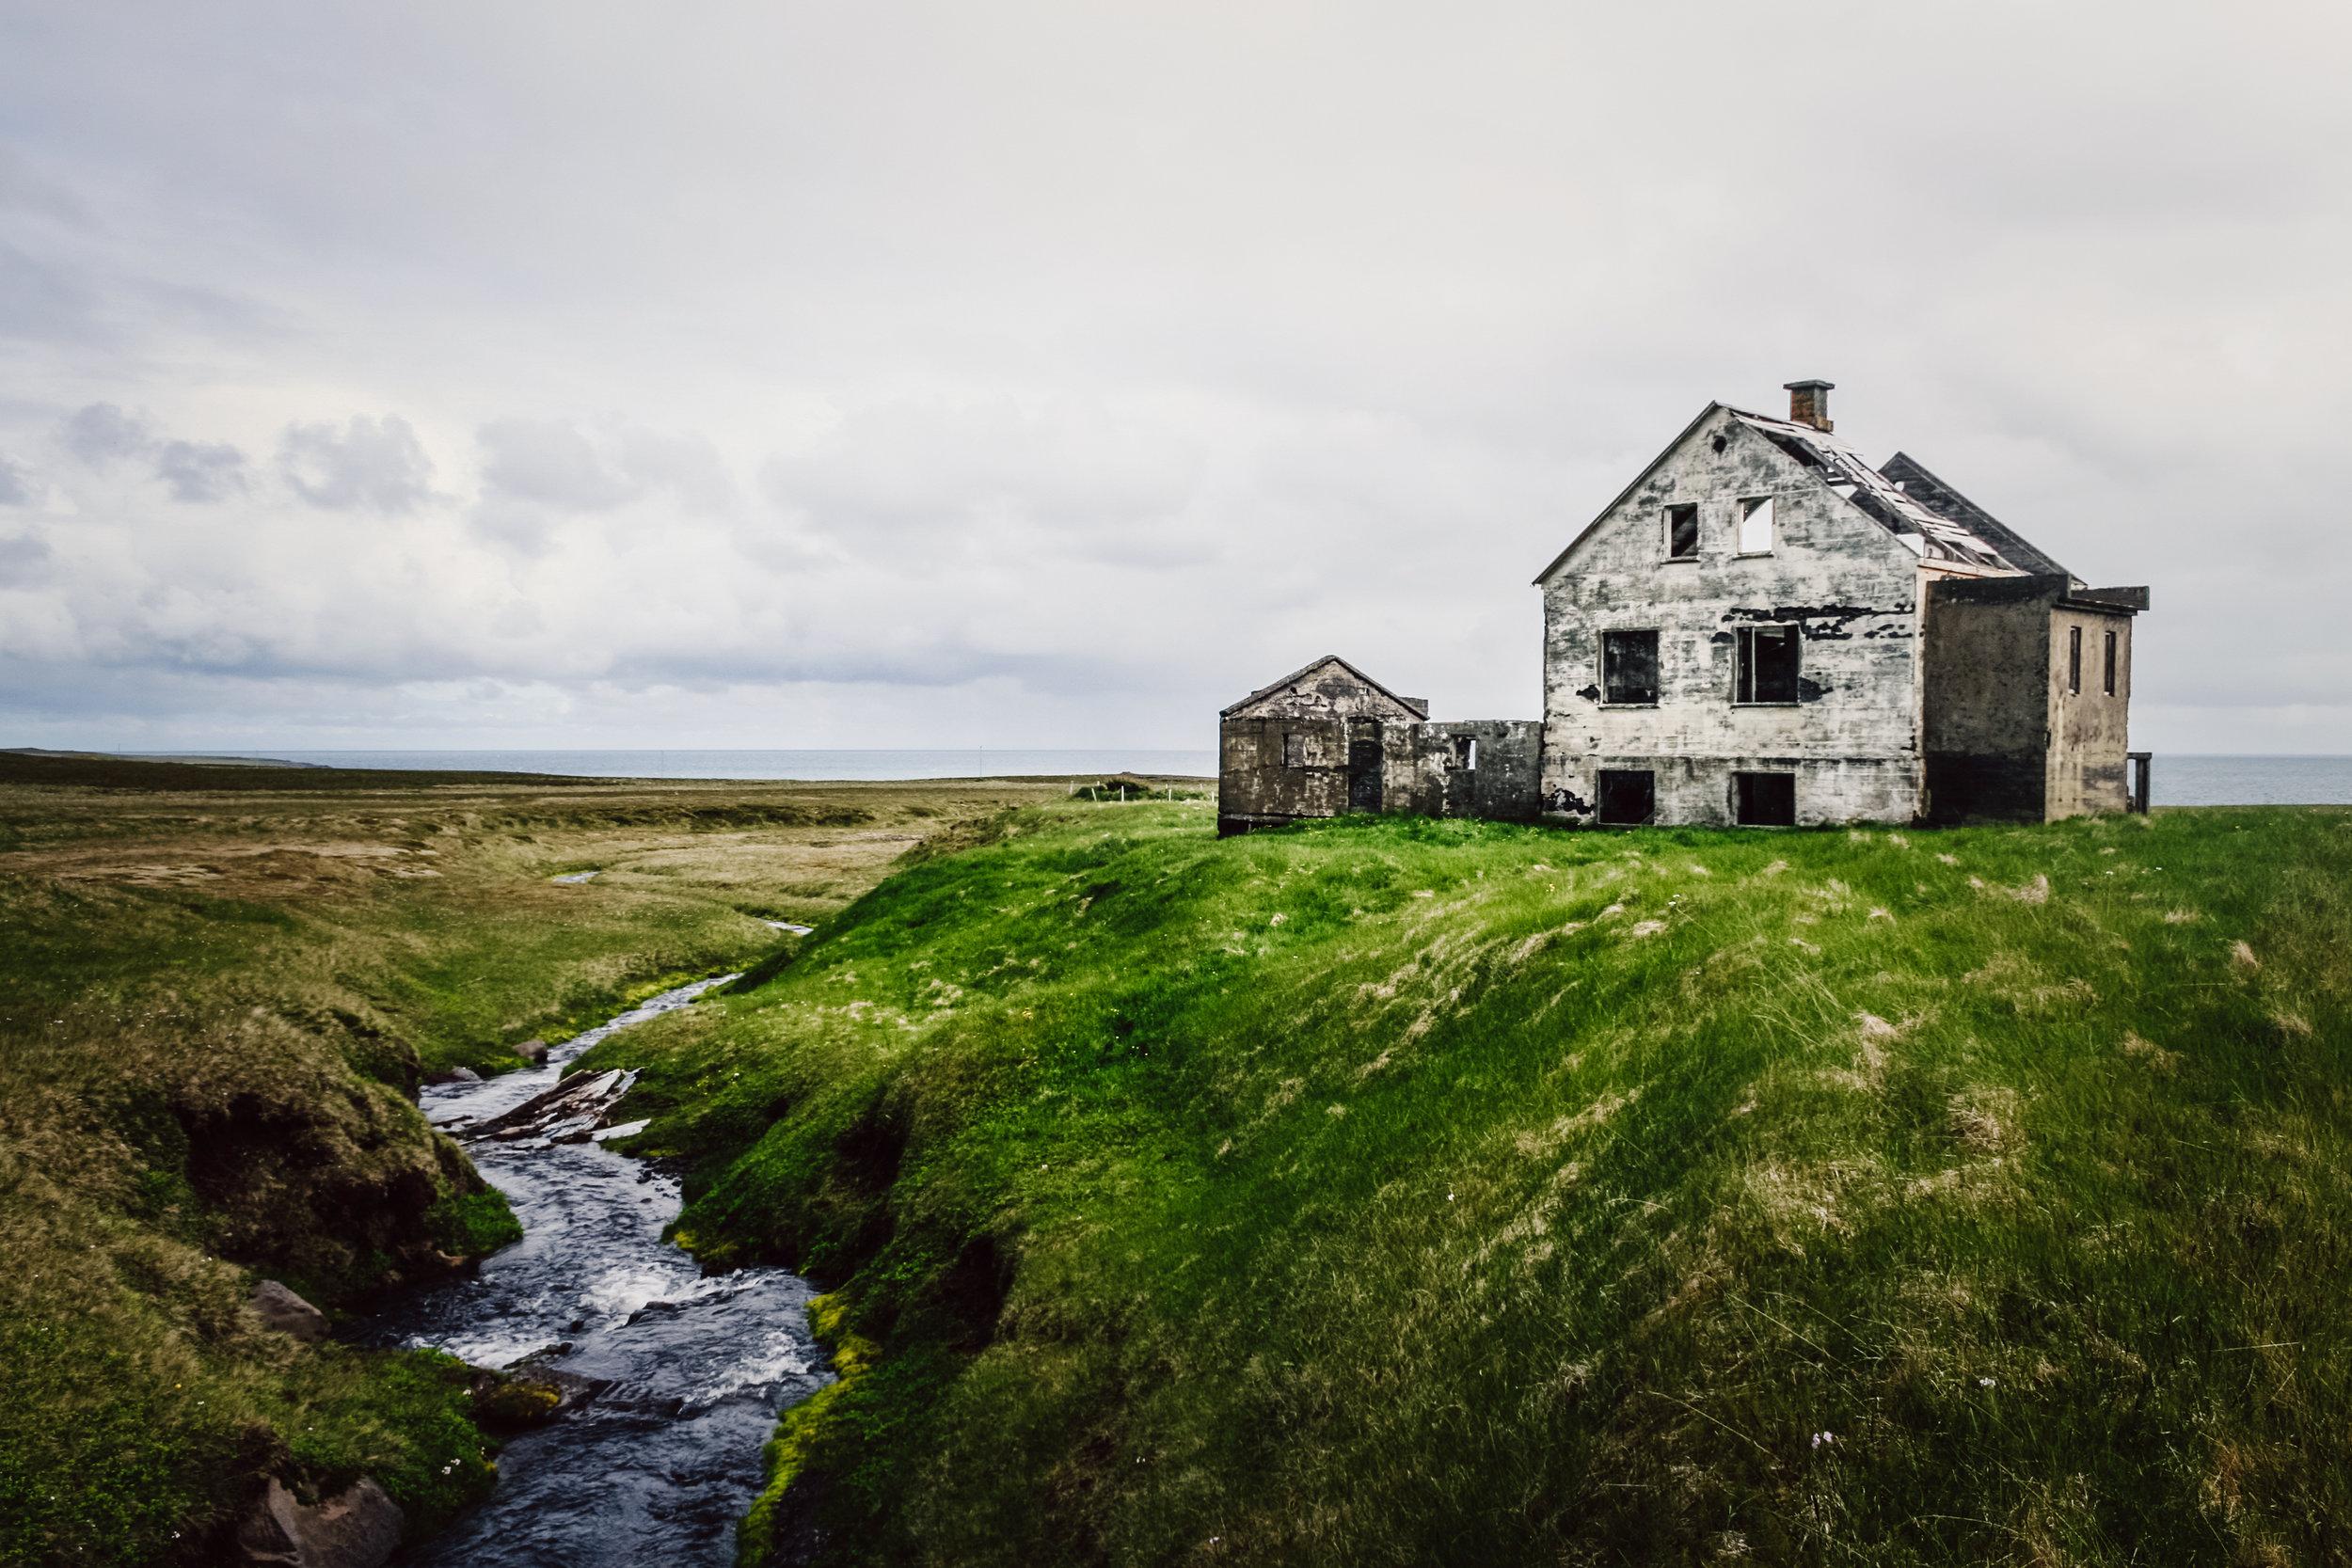 Philip-Nix-Iceland-2018-Full-50 copy.jpg